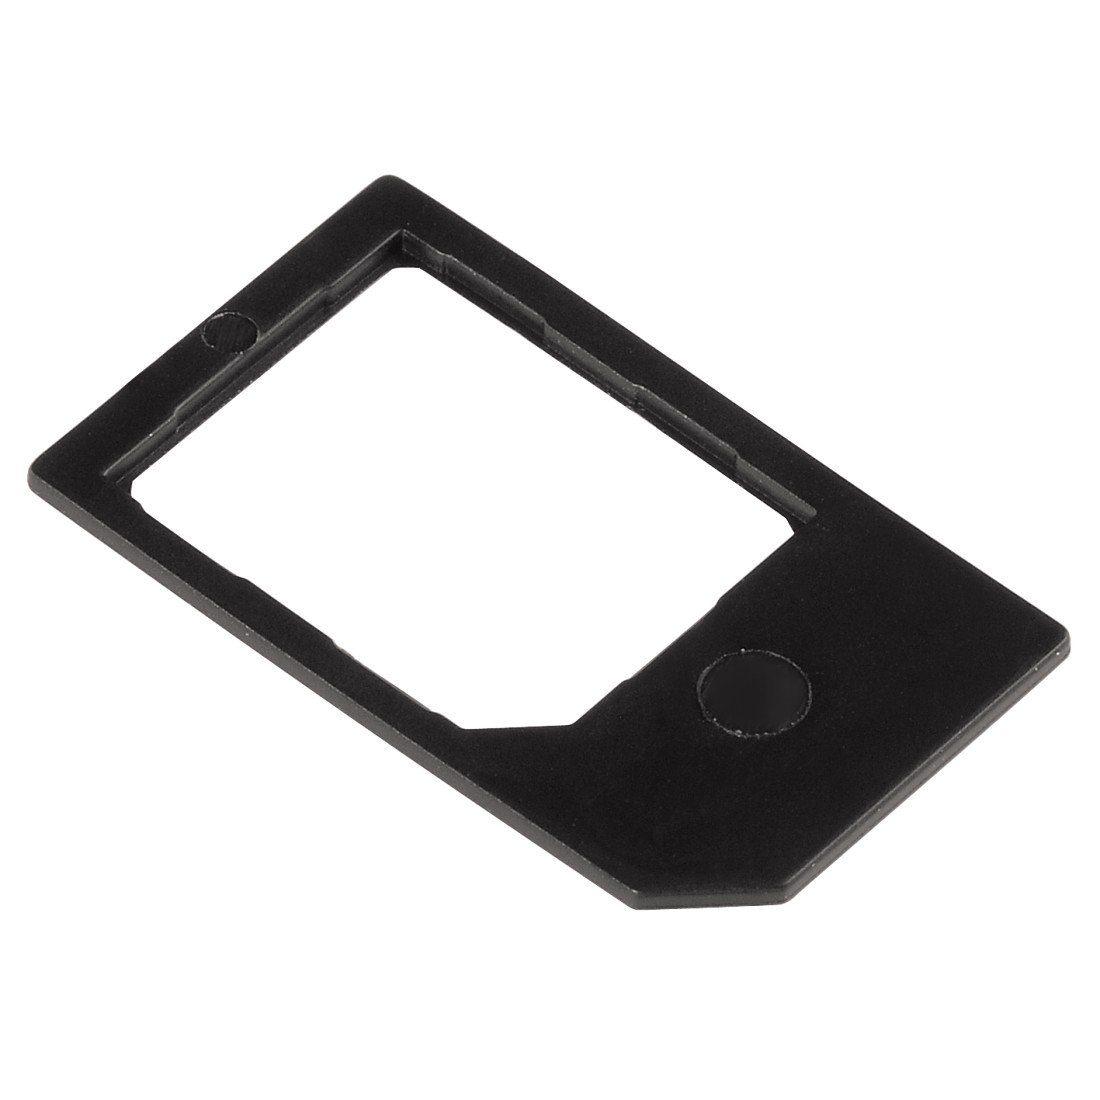 Hama Micro SIM-/SIM-Adapter